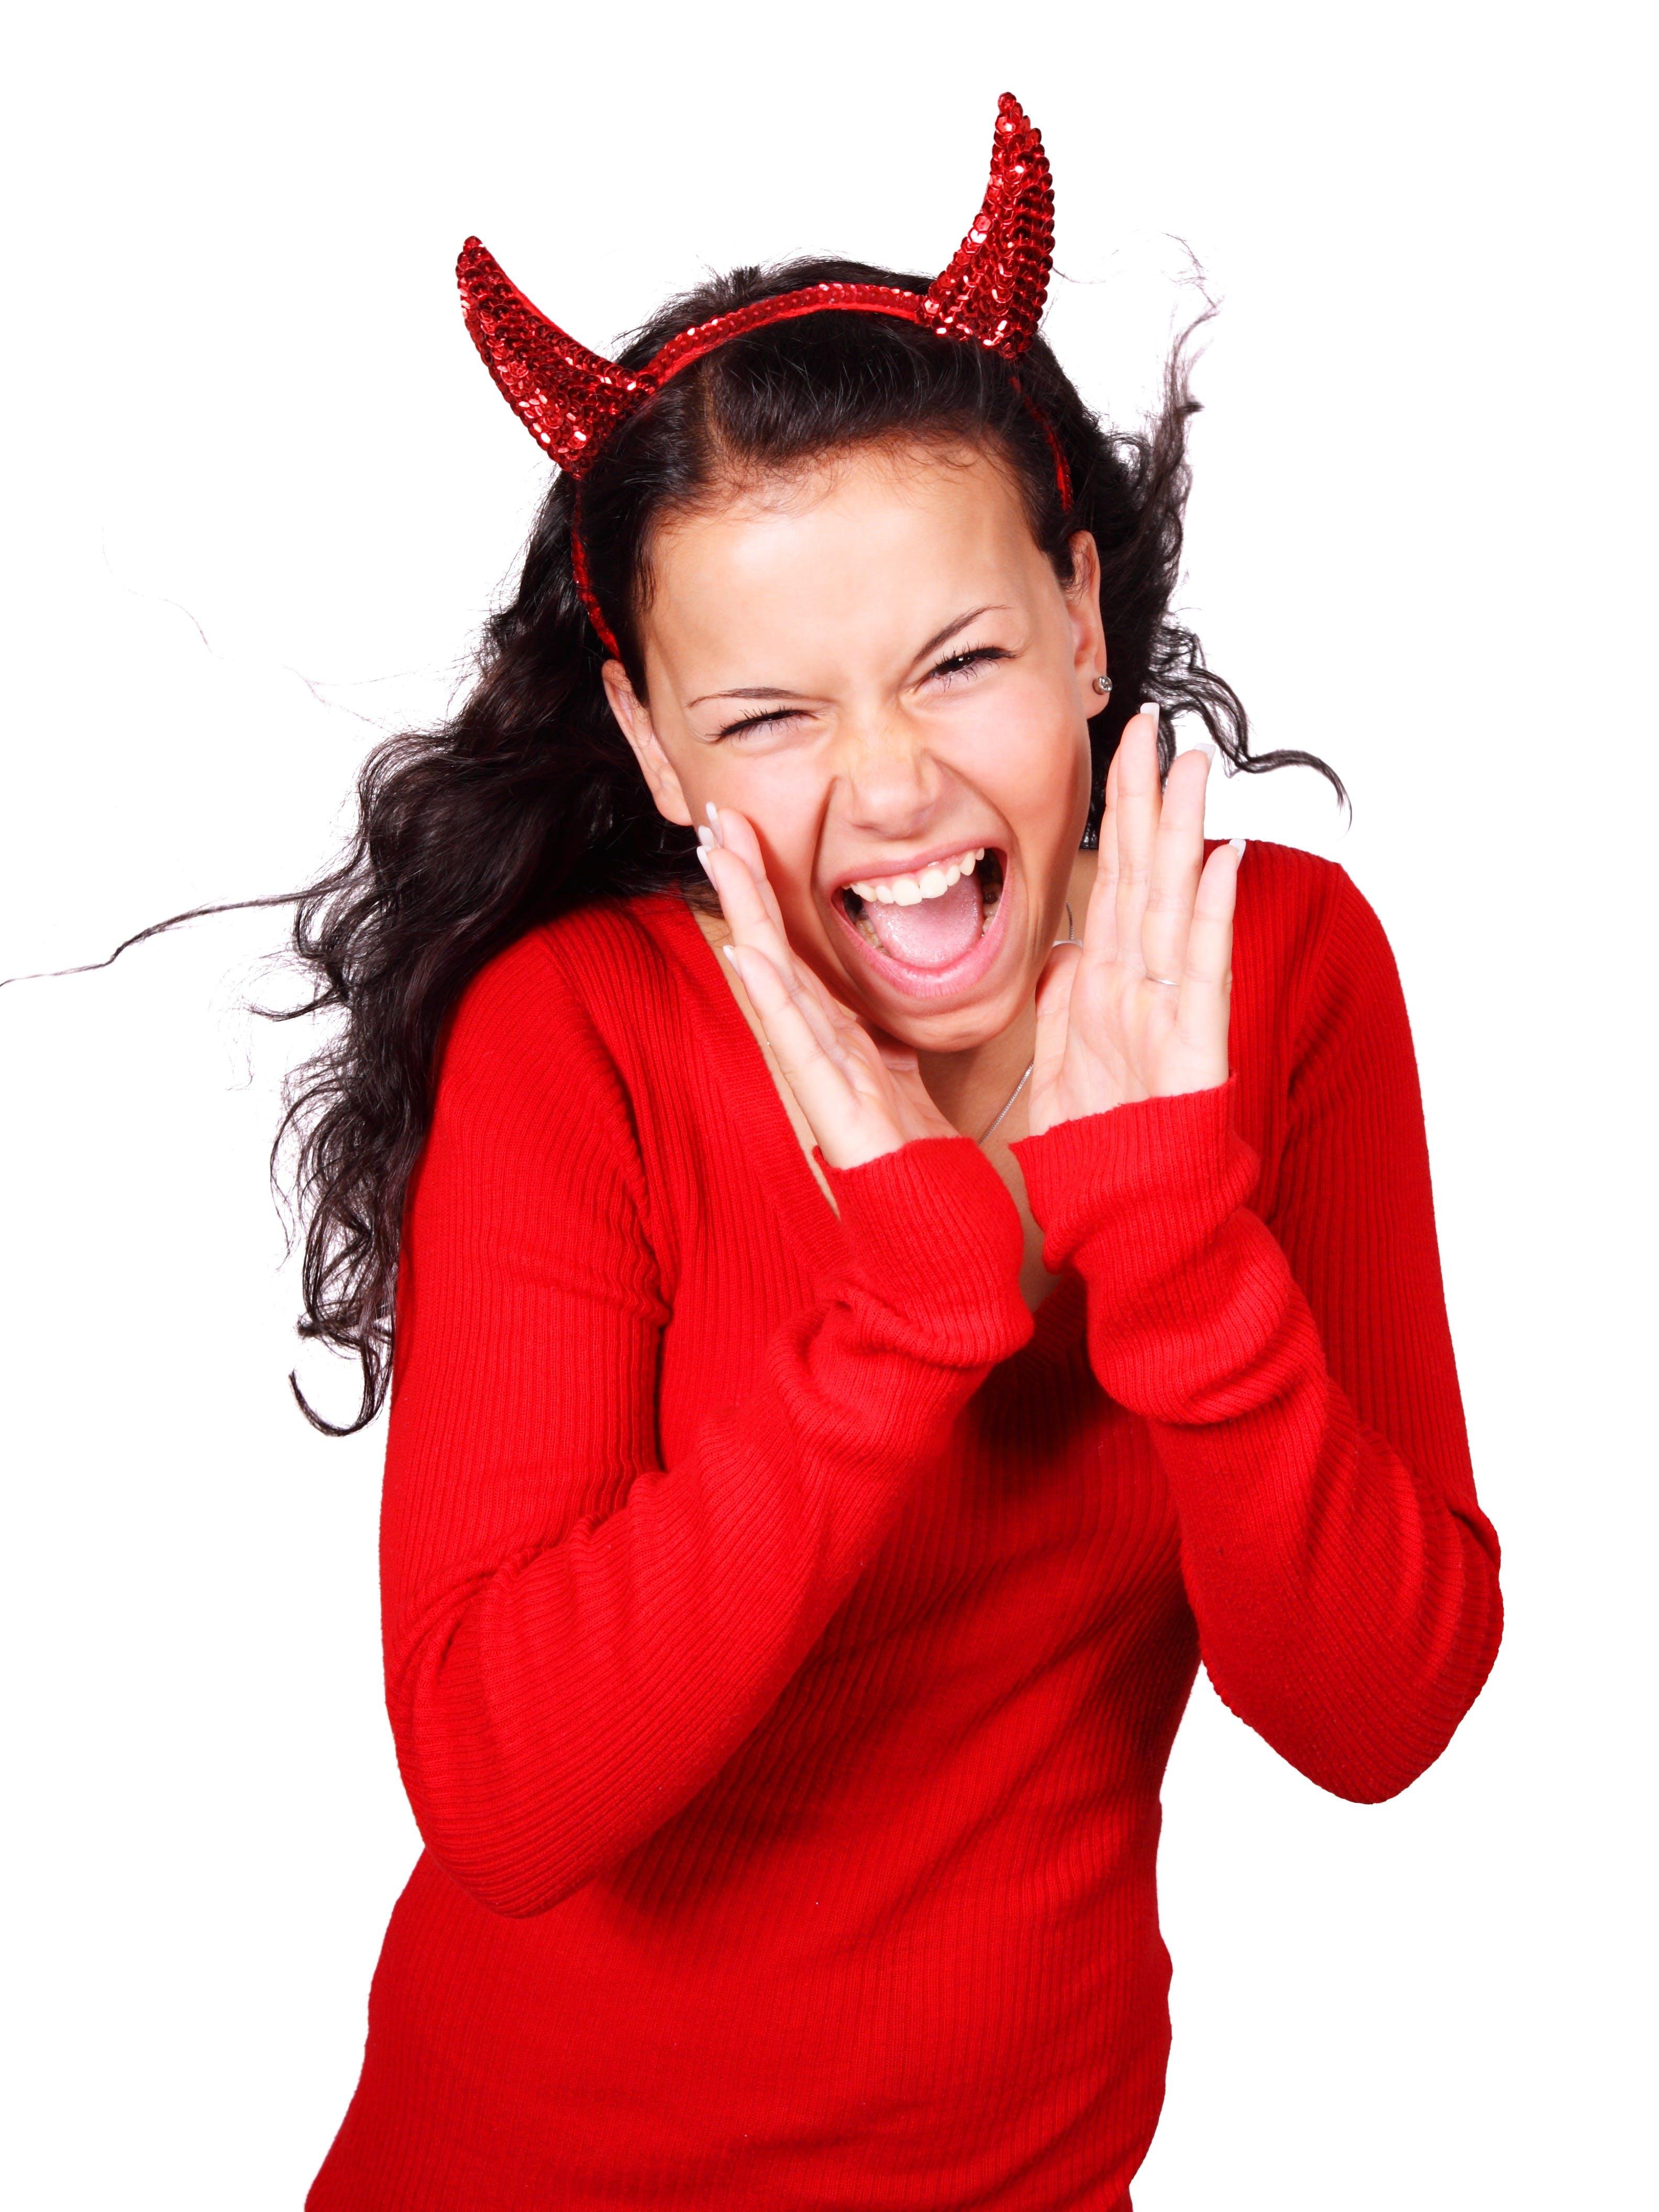 Shouting Woman Wearing Red Devil Horns Headband